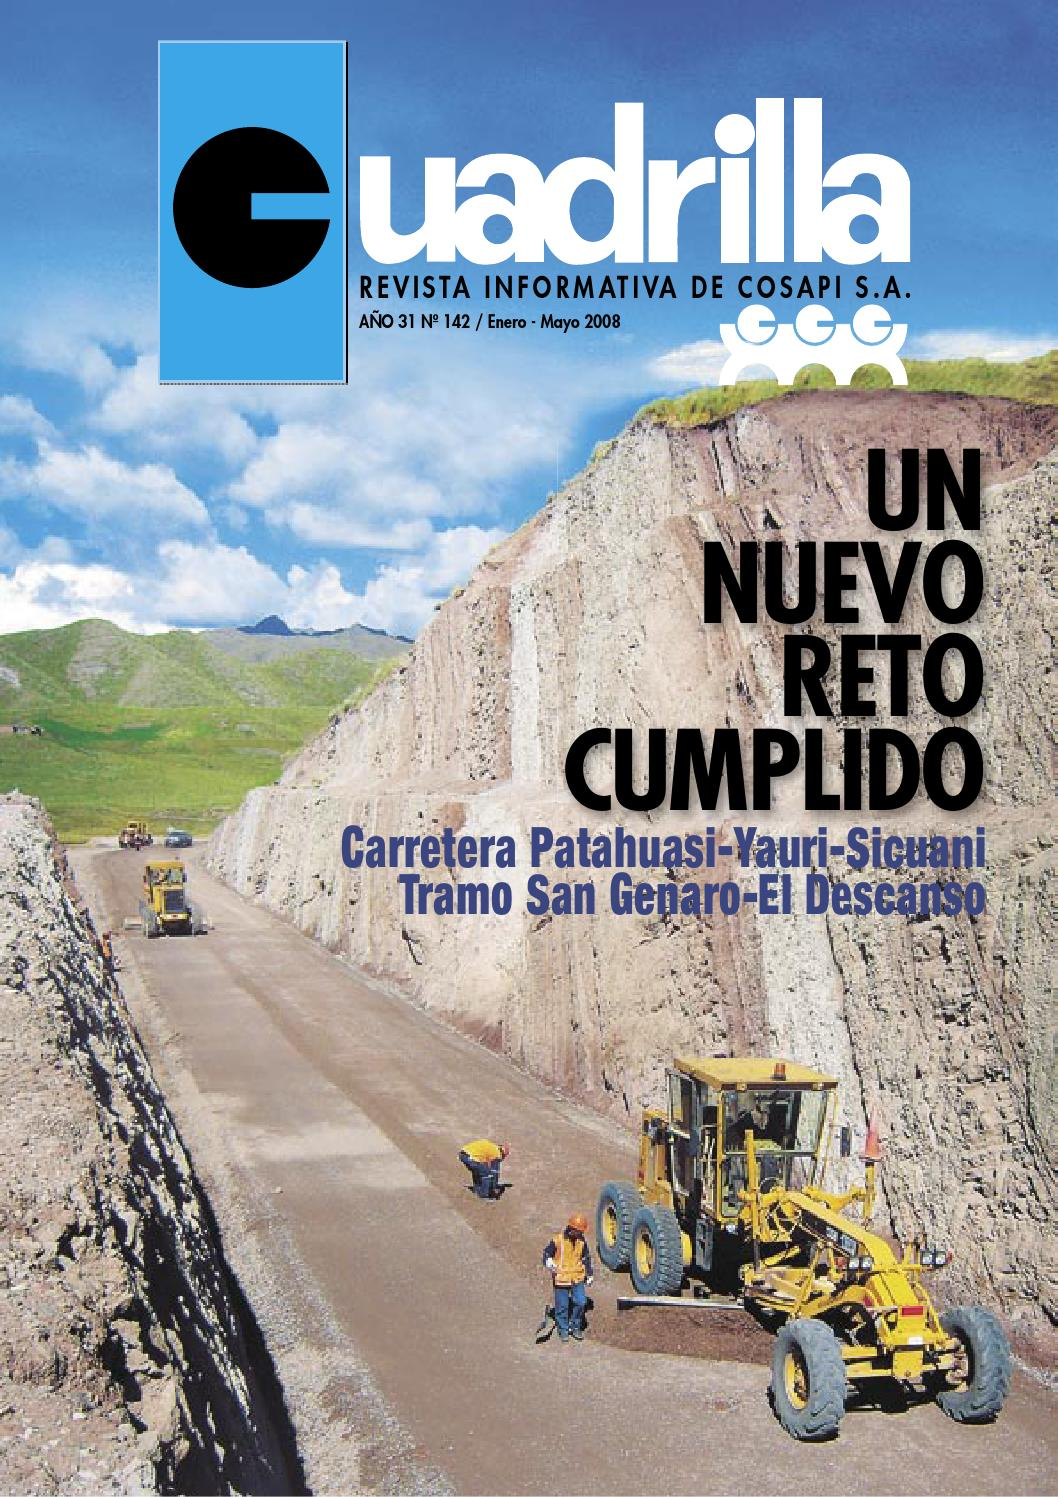 Cosapi revista cuadrilla 142 by Cosapi - issuu